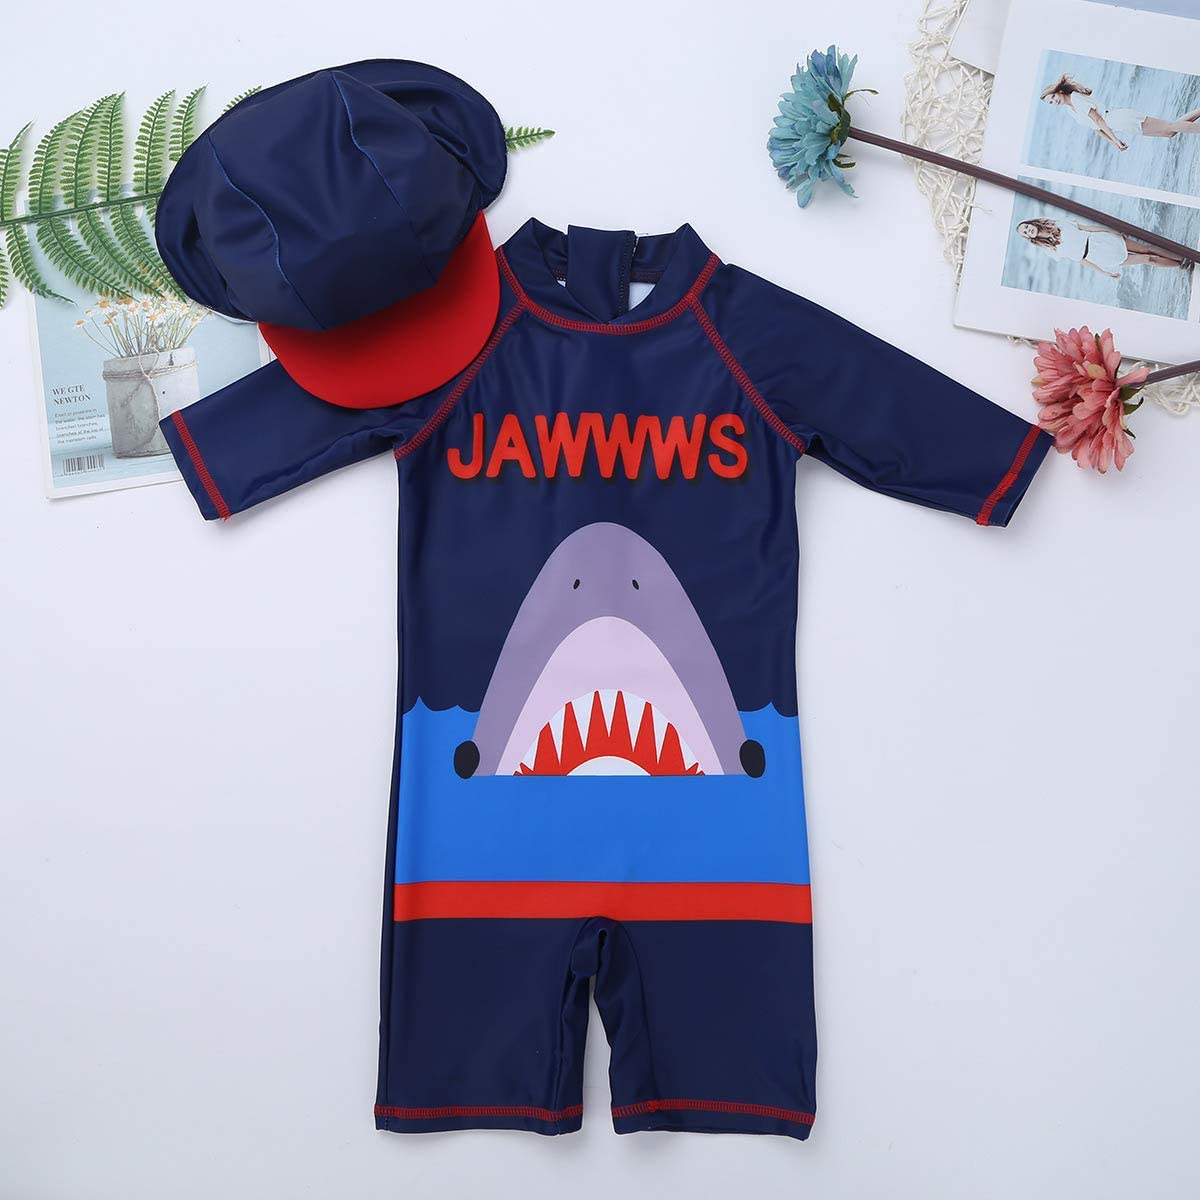 moily Kids Baby Boys Shark Bro Swimsuit Rash Guard Shorty Shirts with Sun Cap Sun Protective Beachwear